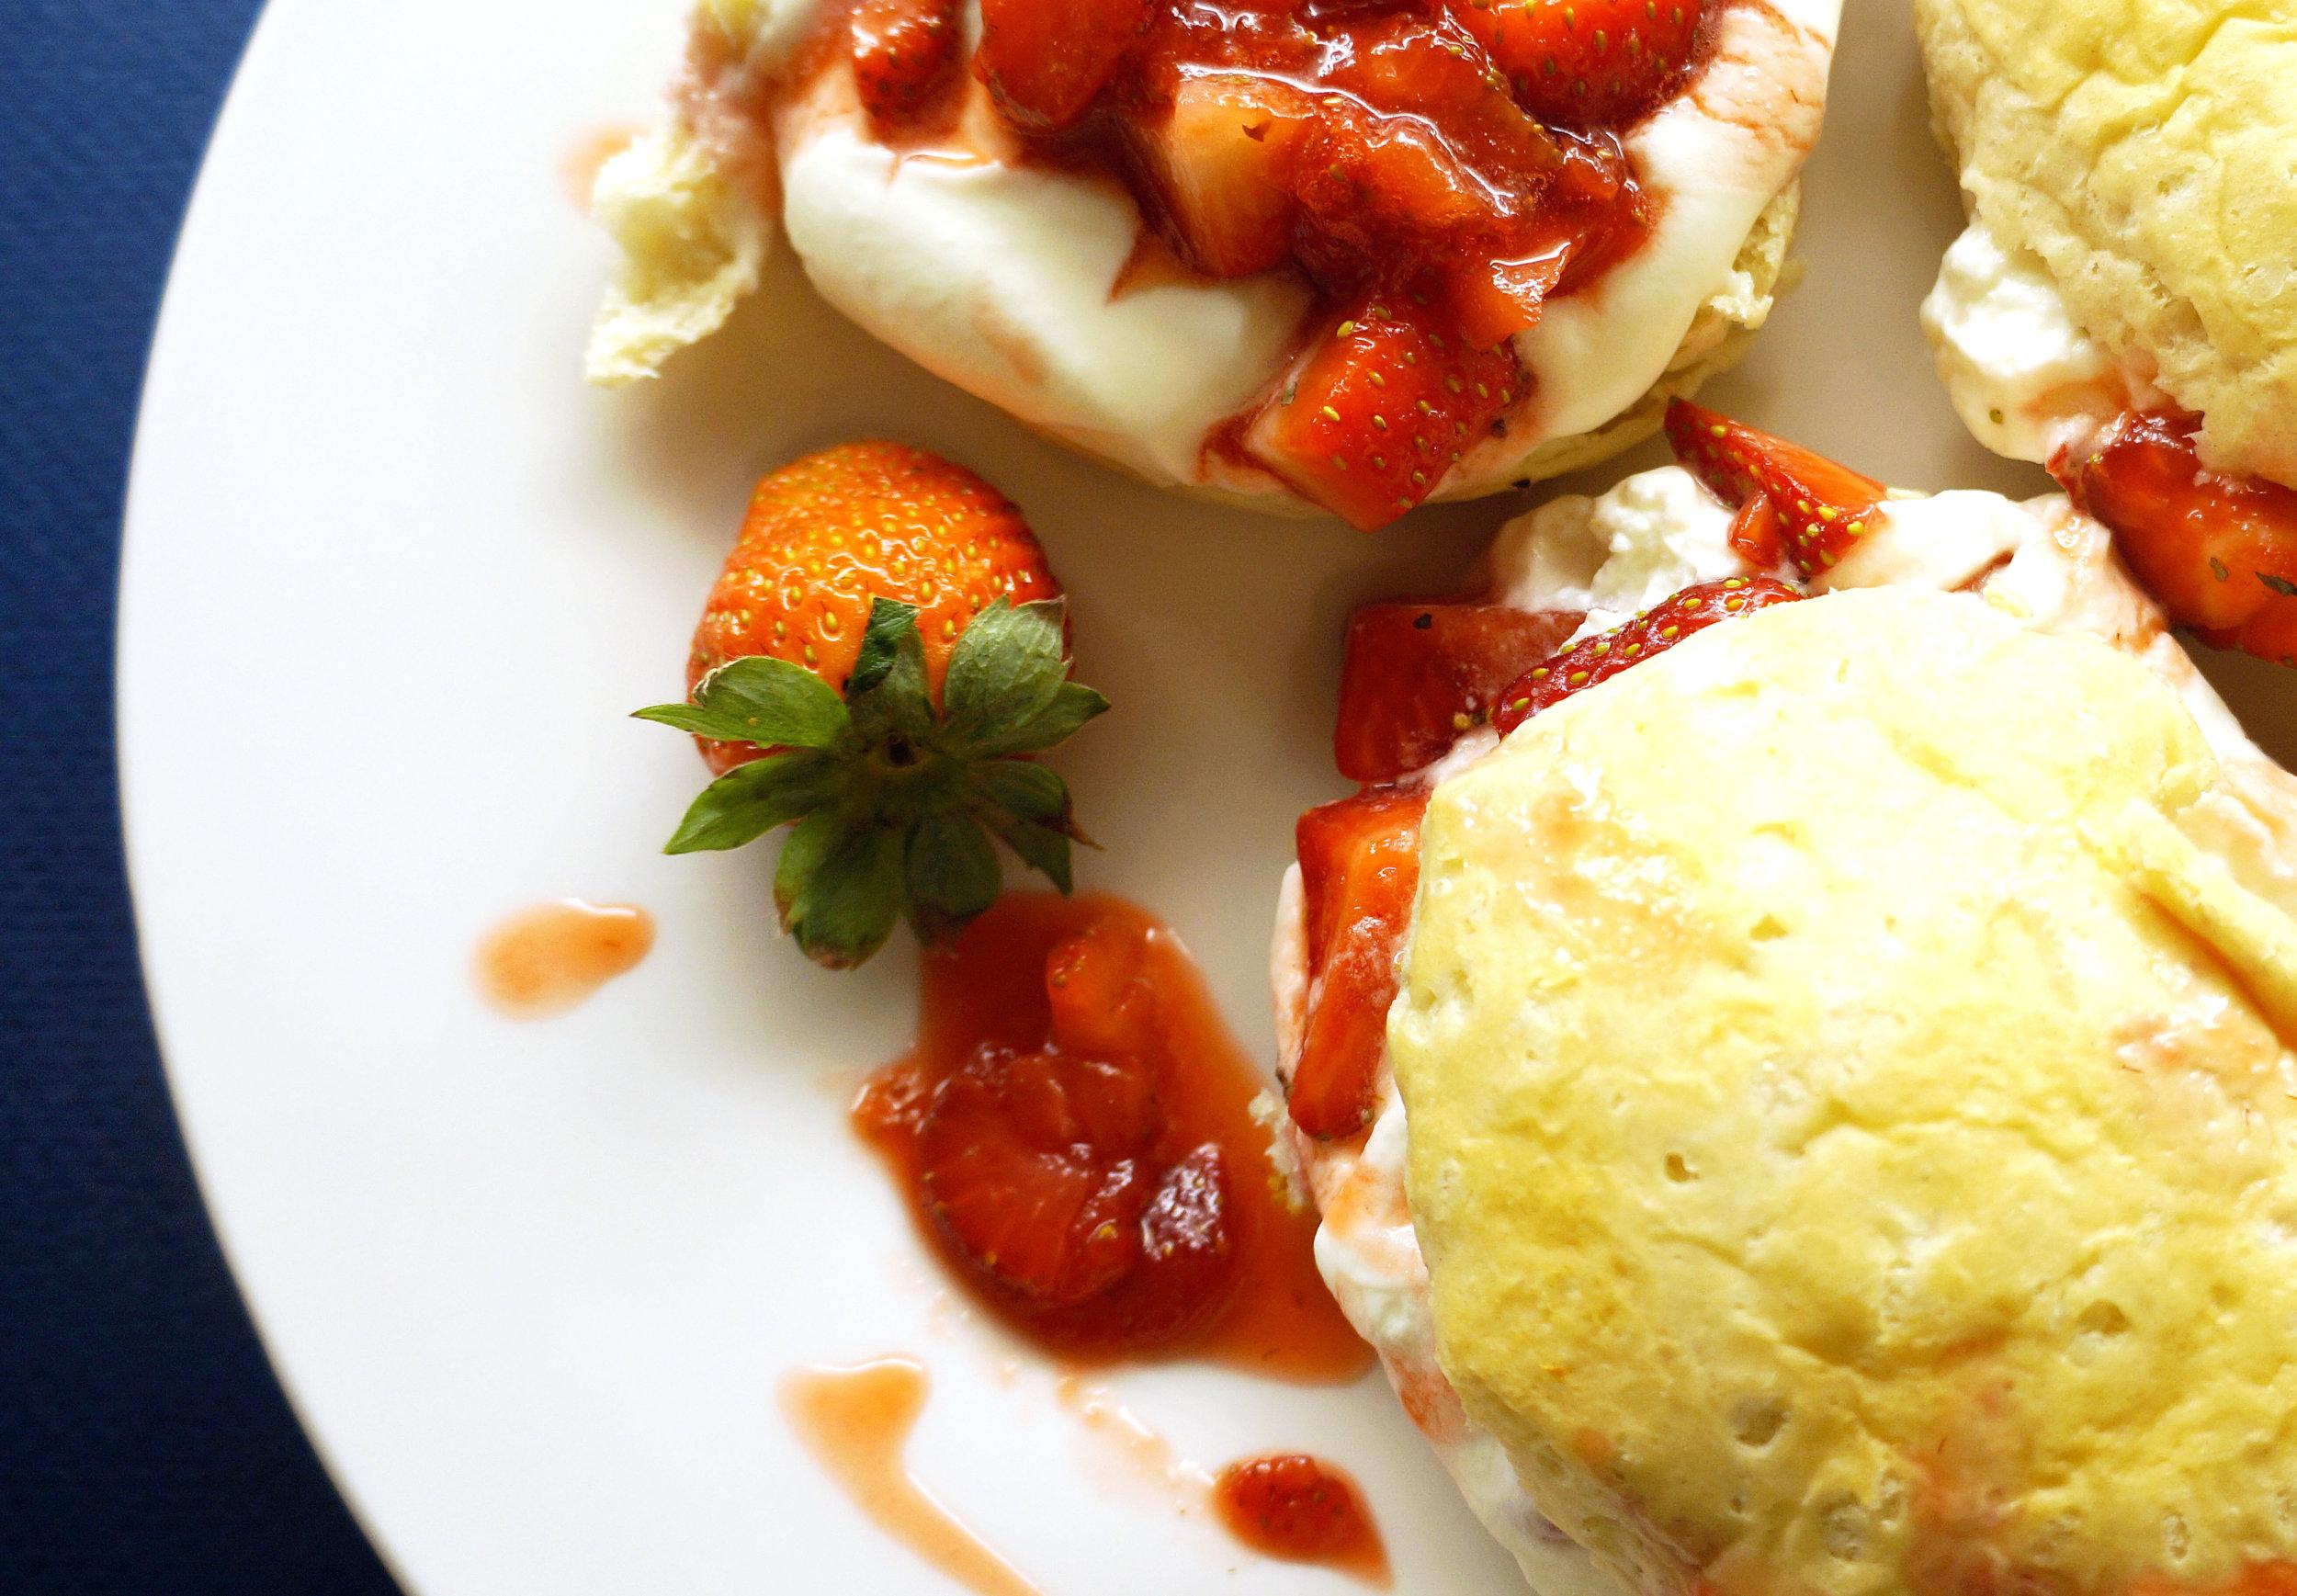 Andrea Fenise Memphis Fashion and Food Blogger shares a strawberry shortcake recipe